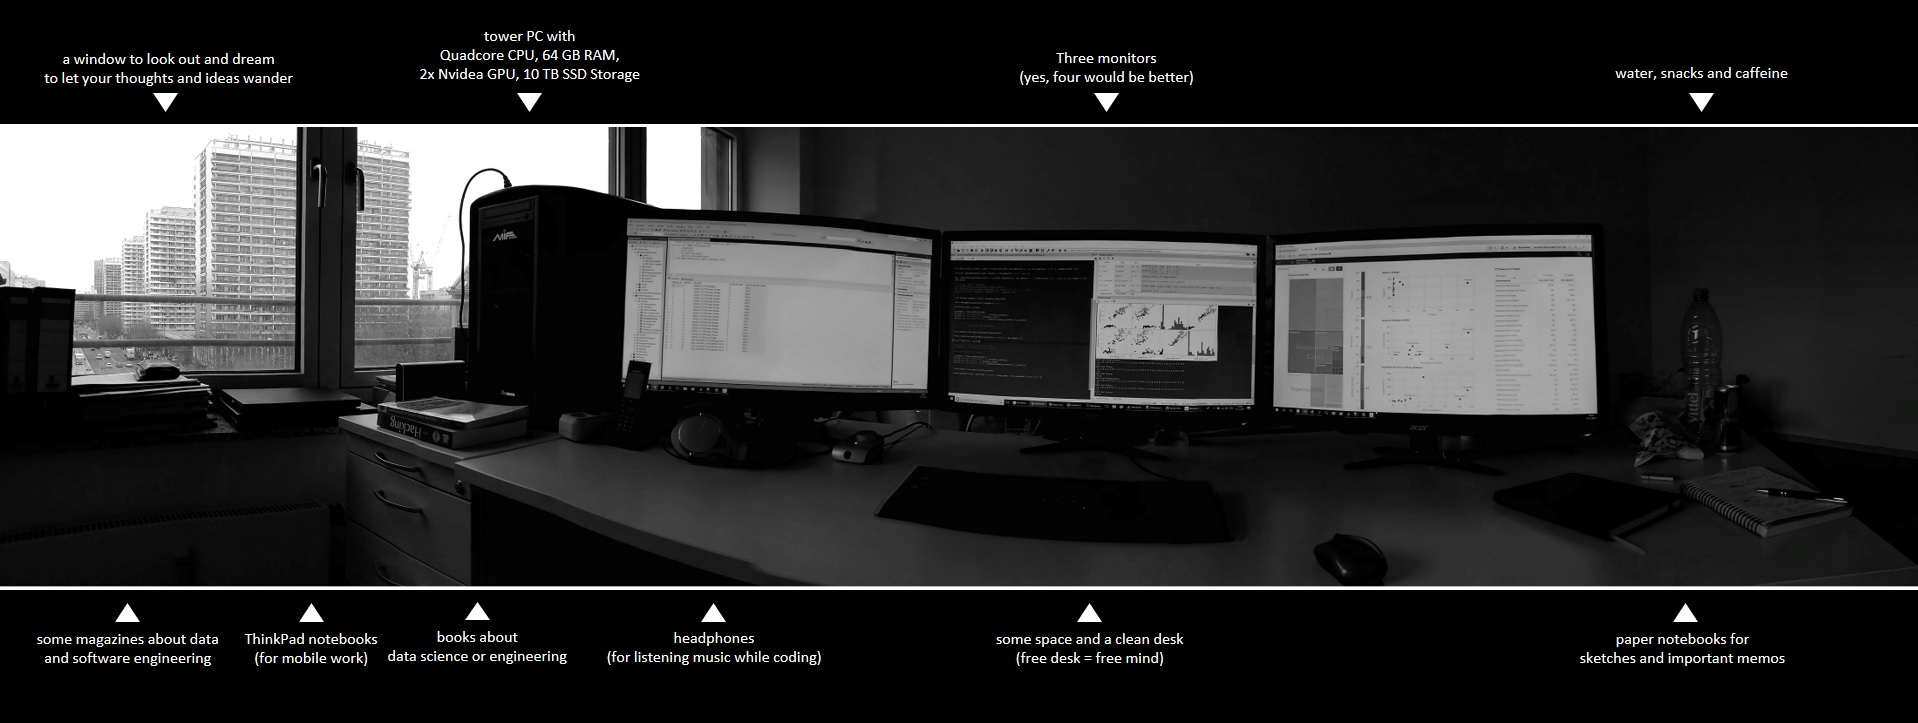 My Desk for Data Science – Data Science Blog